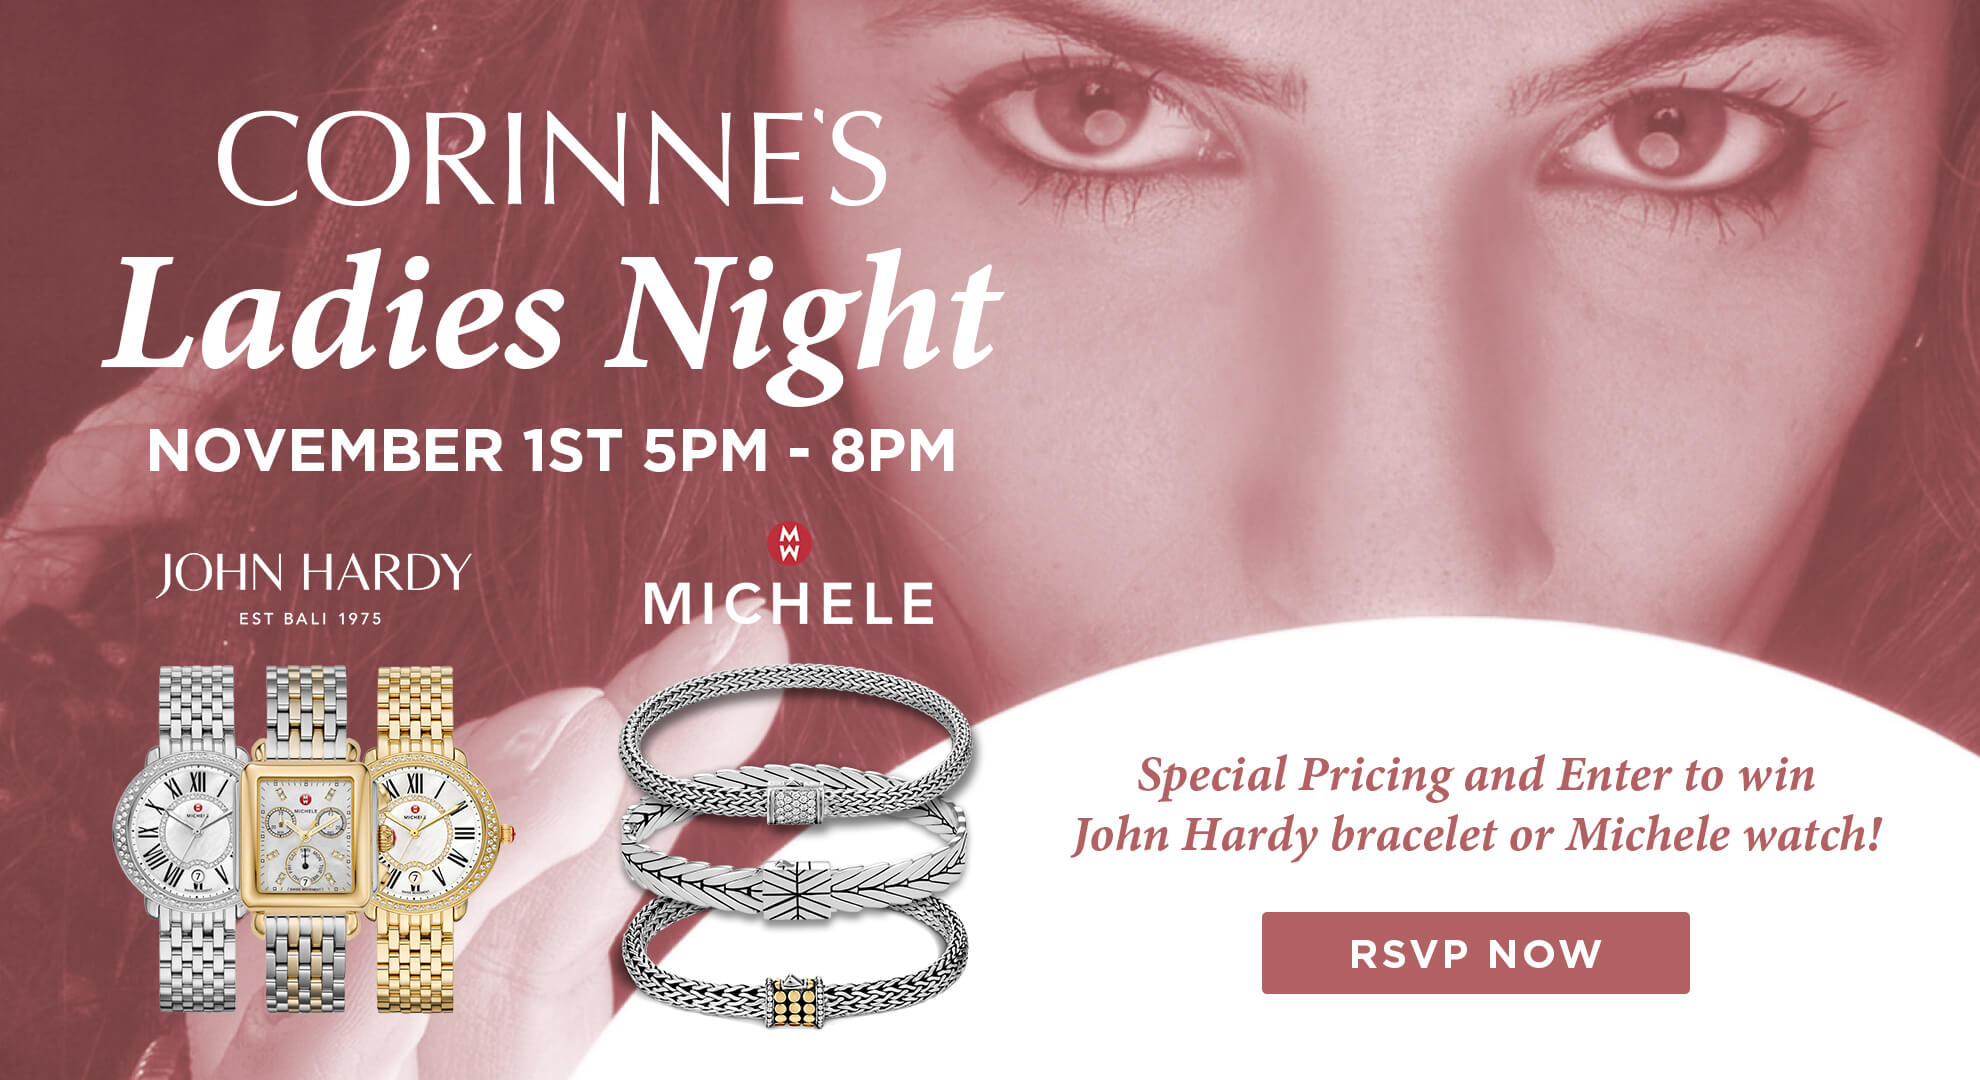 Corinne Jeweler's Ladies Night 2018